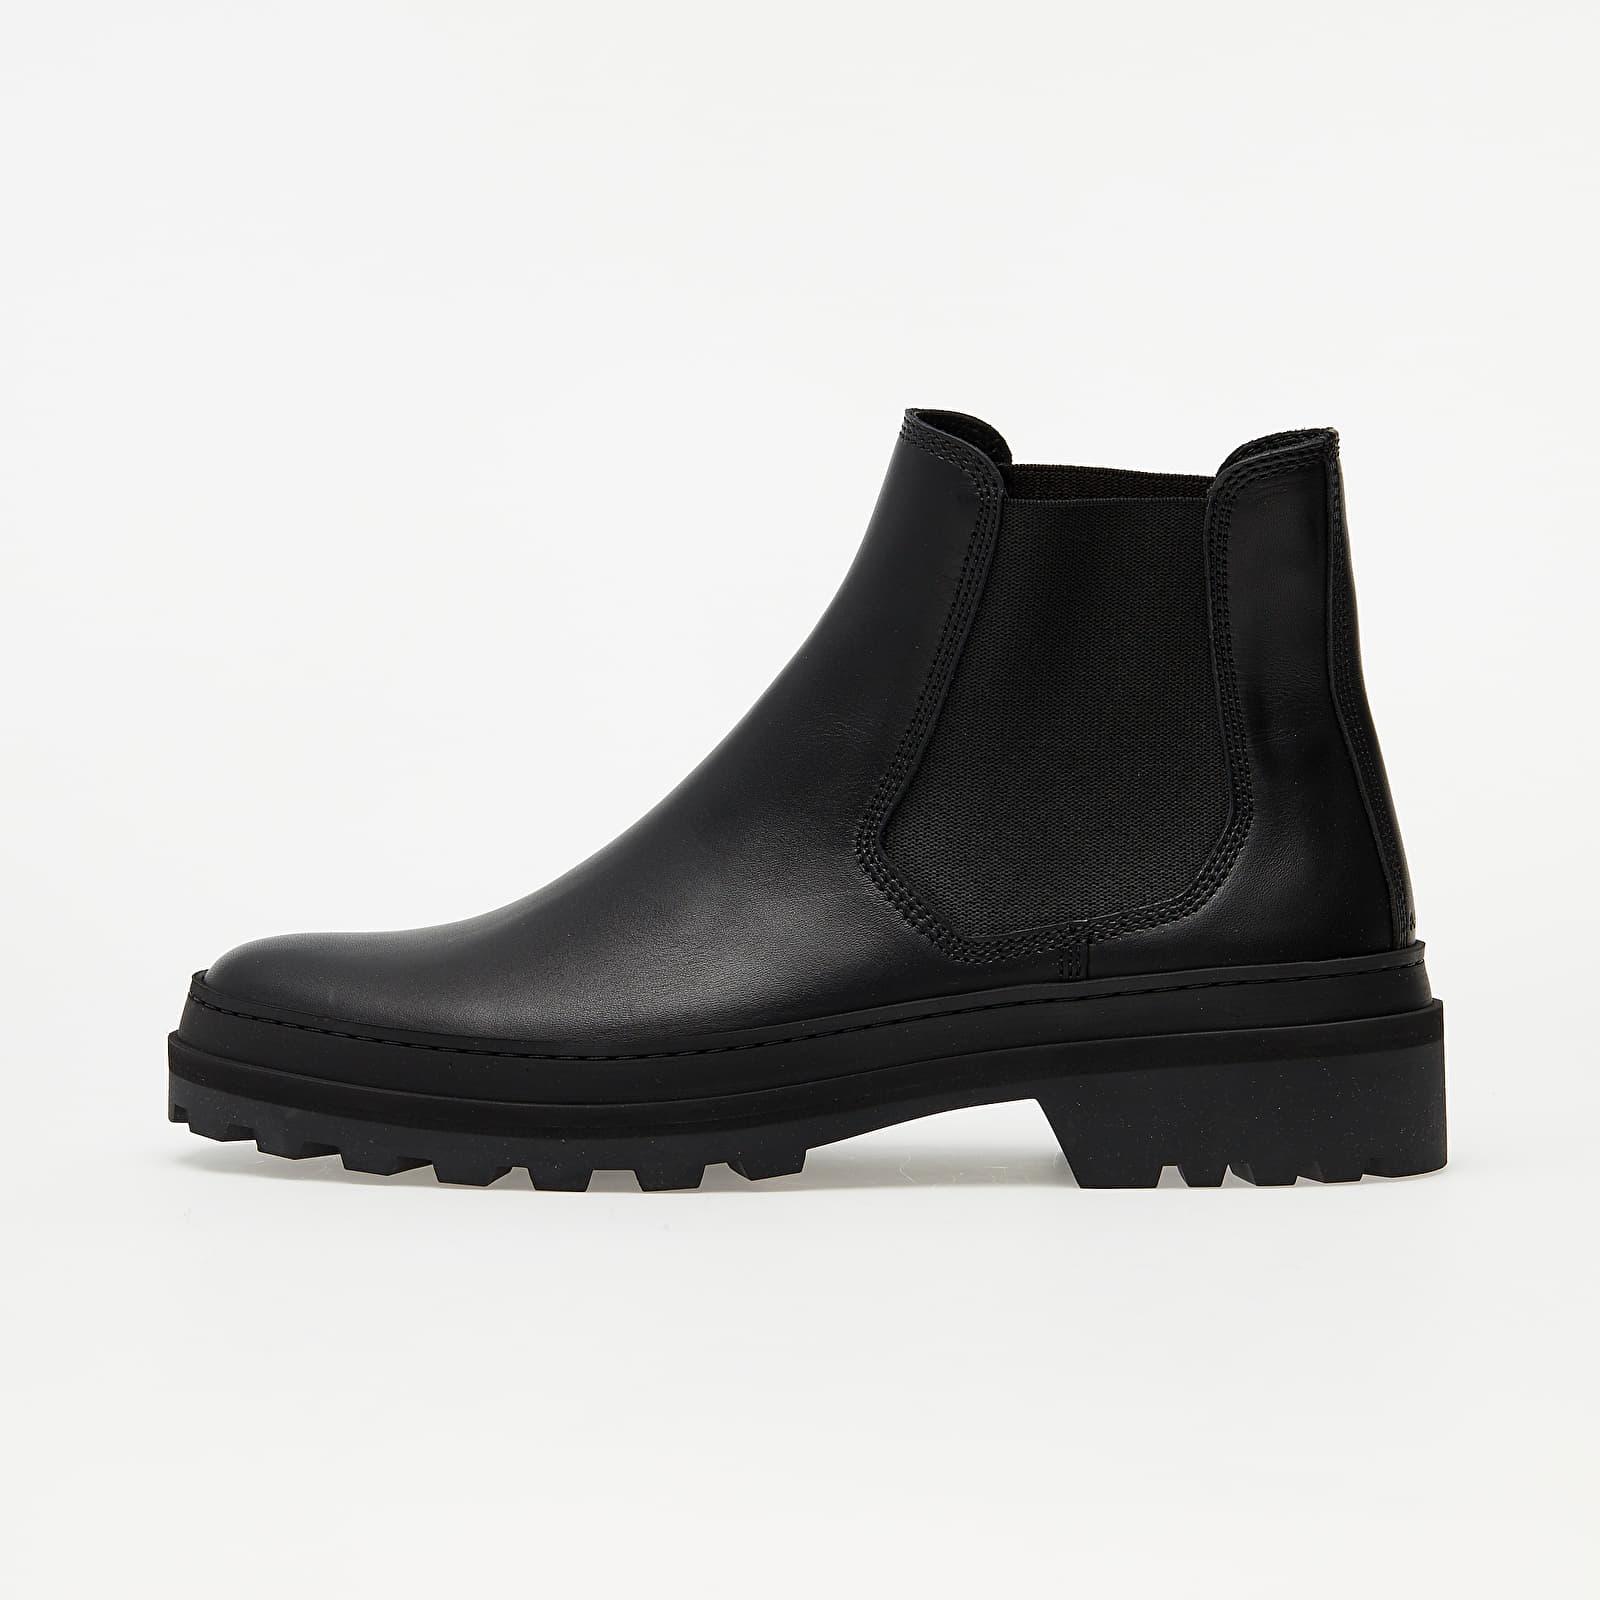 A.P.C. Cali Lug Sole Chelsea Boot Black/ Black/ Black H54194